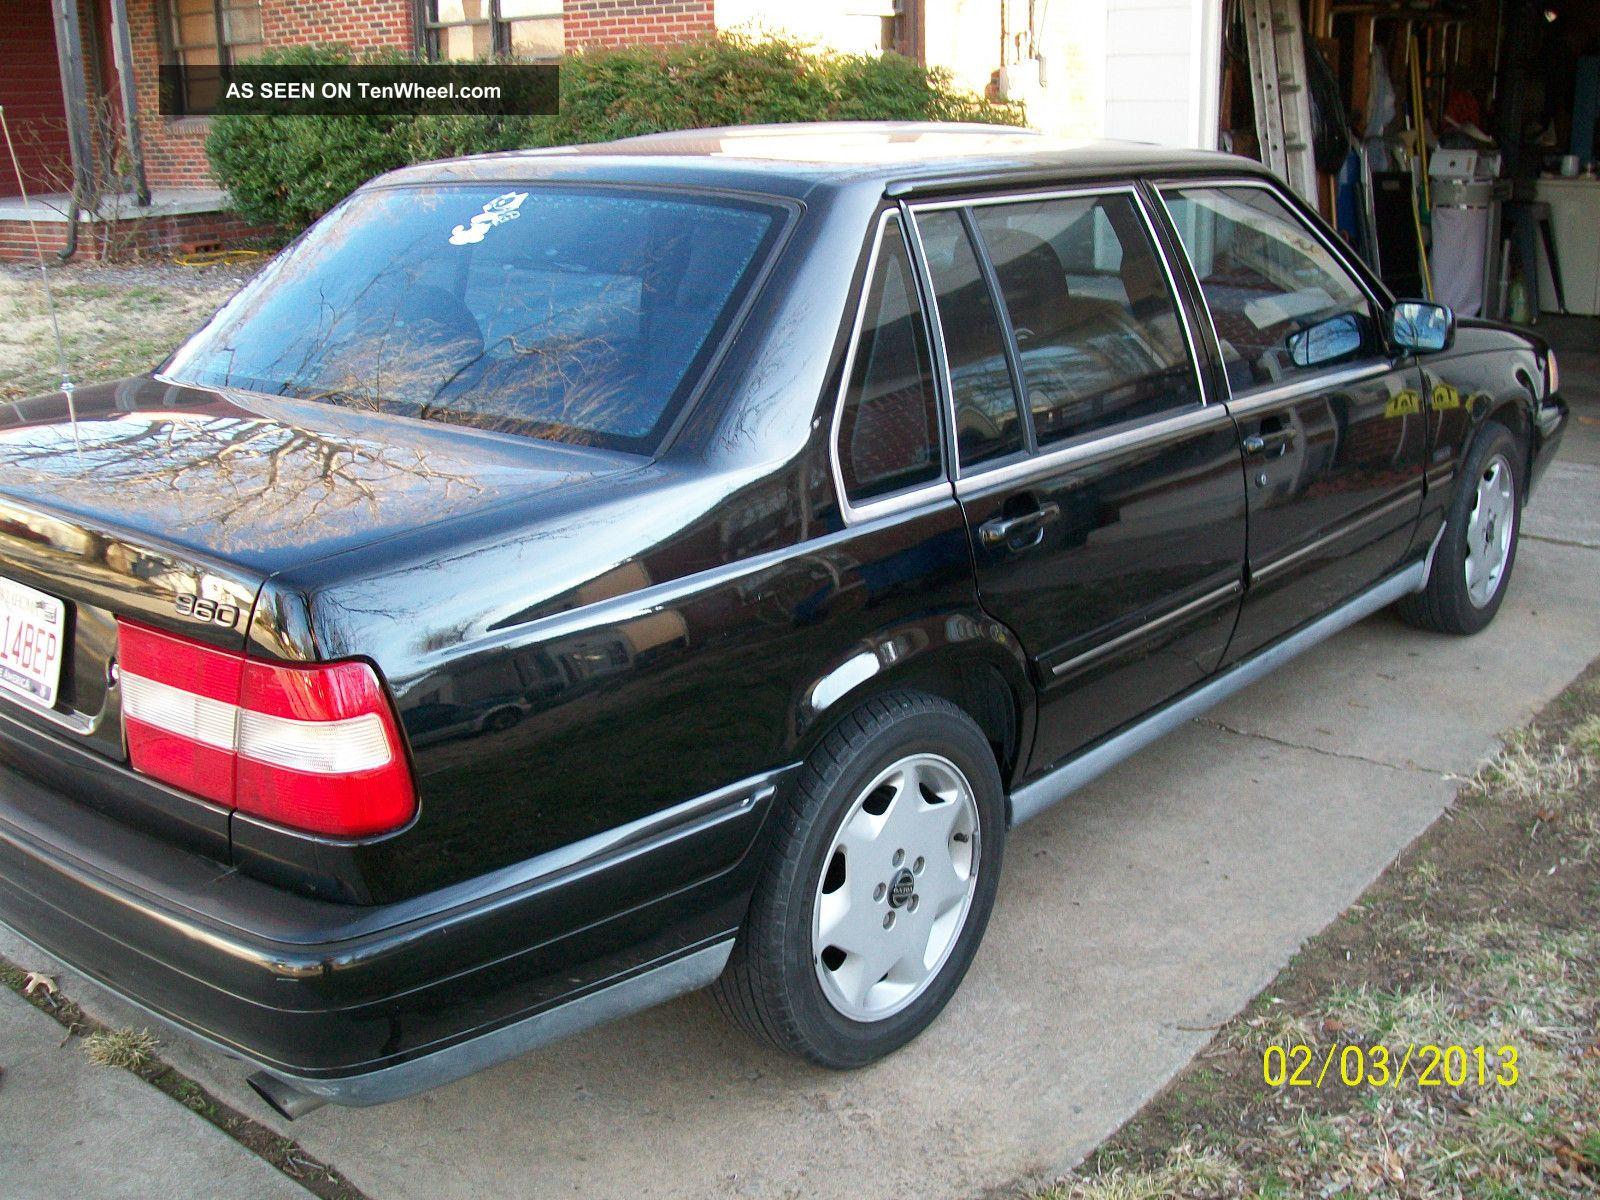 1997 volvo 960 sedan garaged car black with gray interior. Black Bedroom Furniture Sets. Home Design Ideas